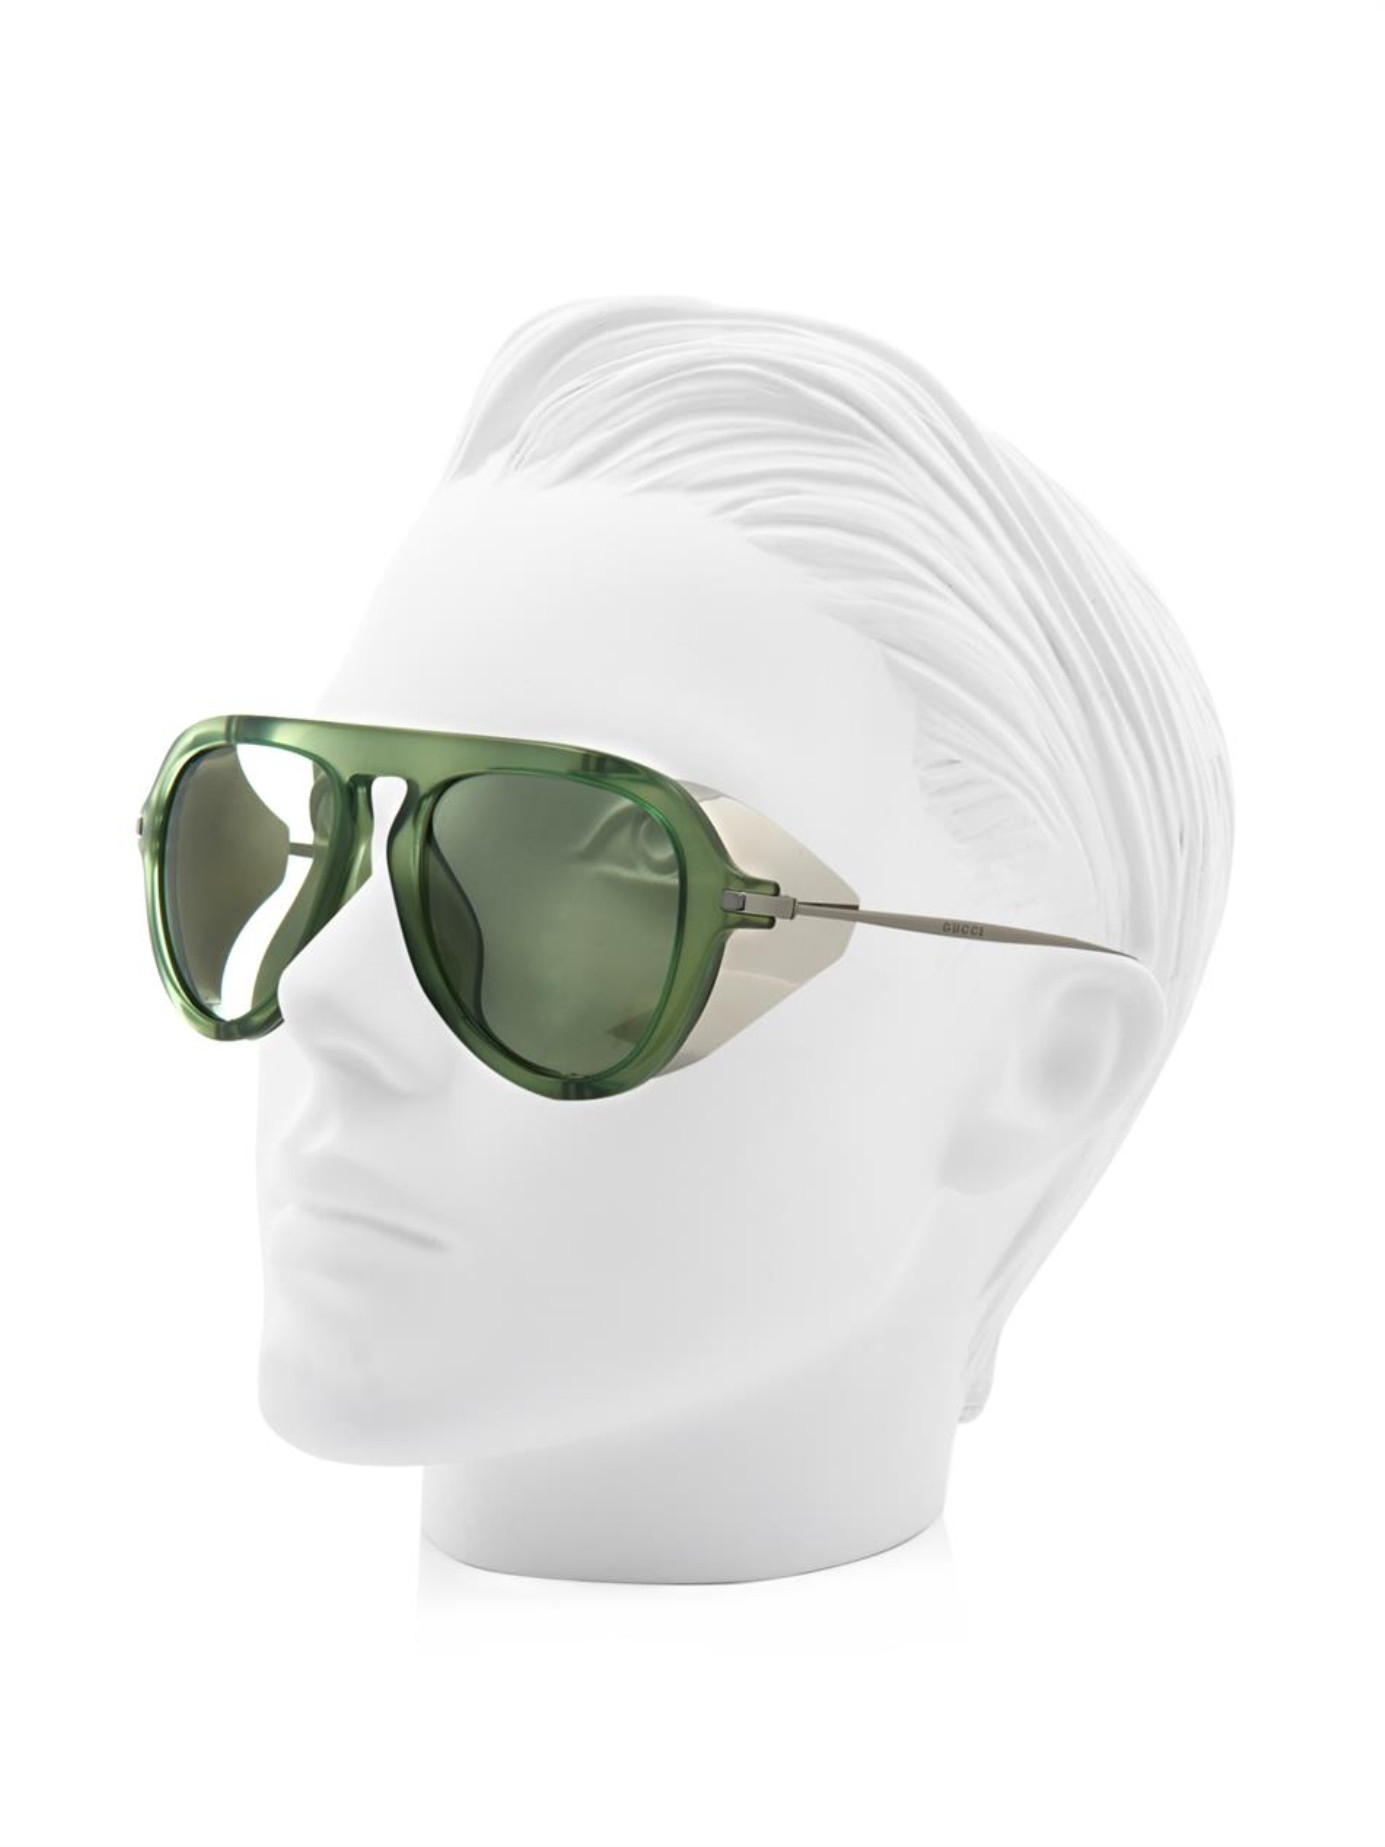 38ccae010 Gucci Metal-Blinker Aviator-Style Sunglasses in Green - Lyst